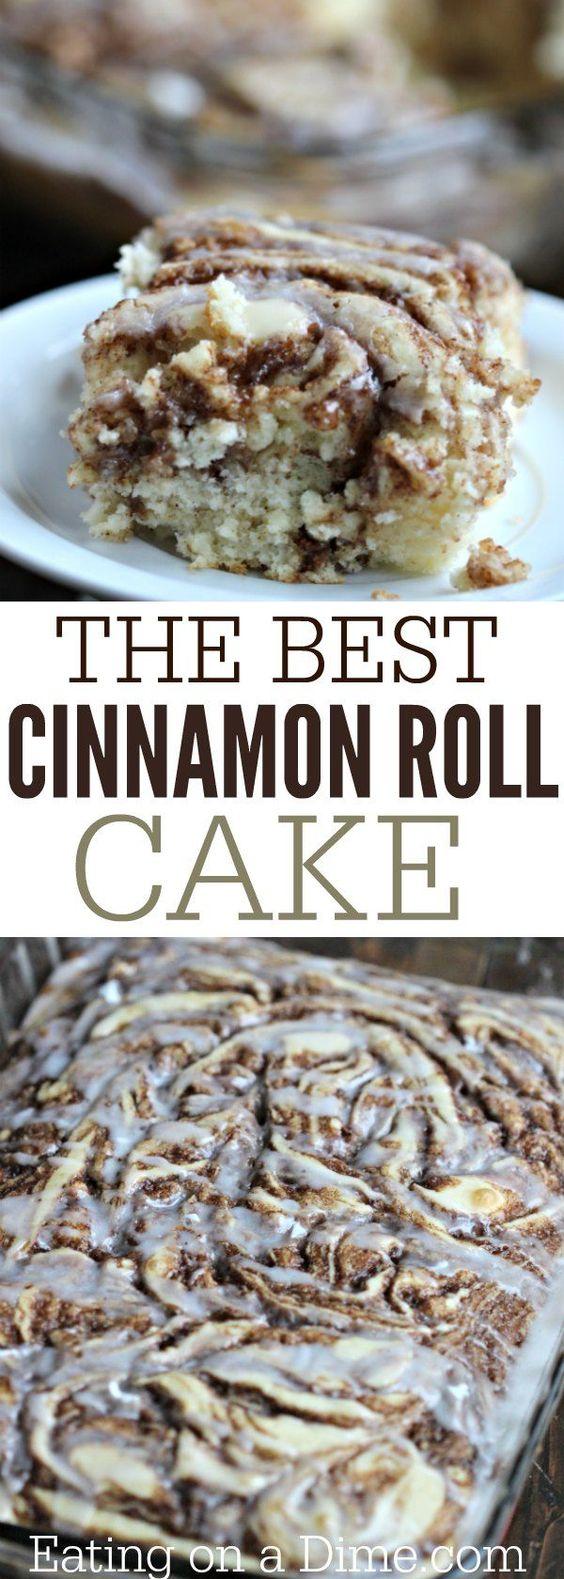 EASY COFFEE CAKE RECIPE – THE BEST CINNAMON ROLL CAKE RECIPE #easyrecipes #coffe #cake #coffecake #cakerecipes #thebest #cinnamon #roll #dessert #dessertrecipes